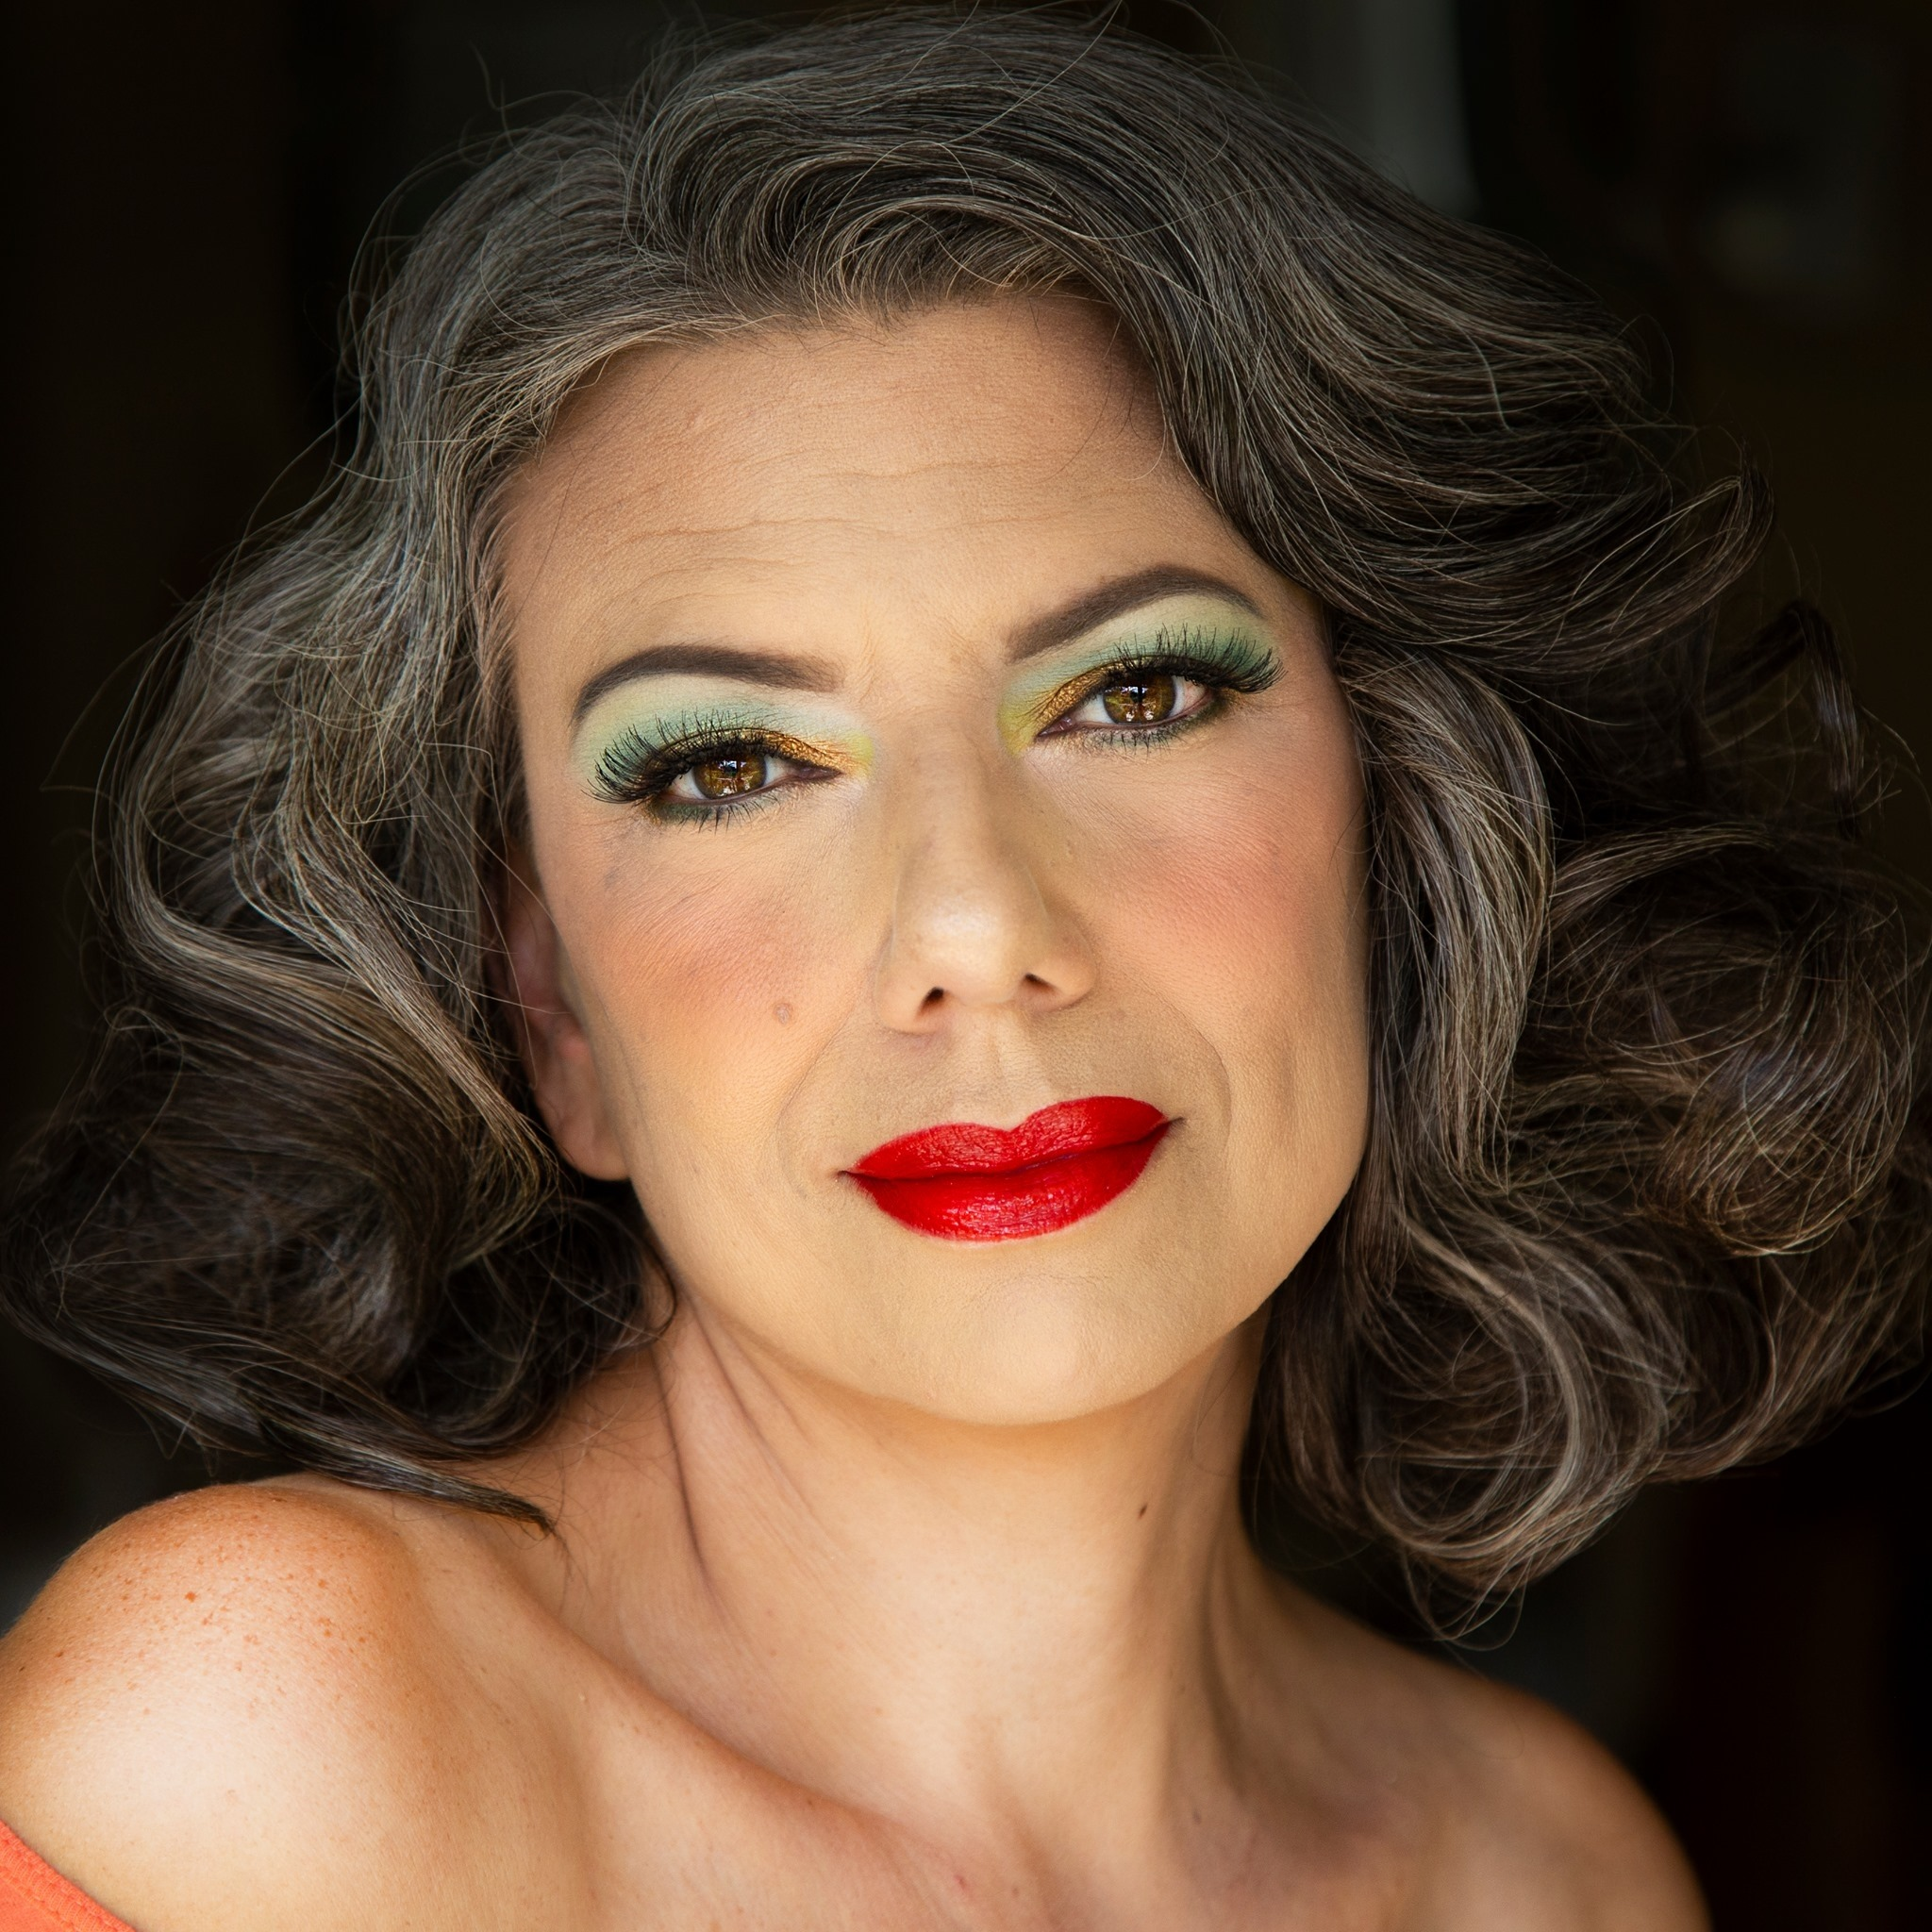 Ursula Gibbons